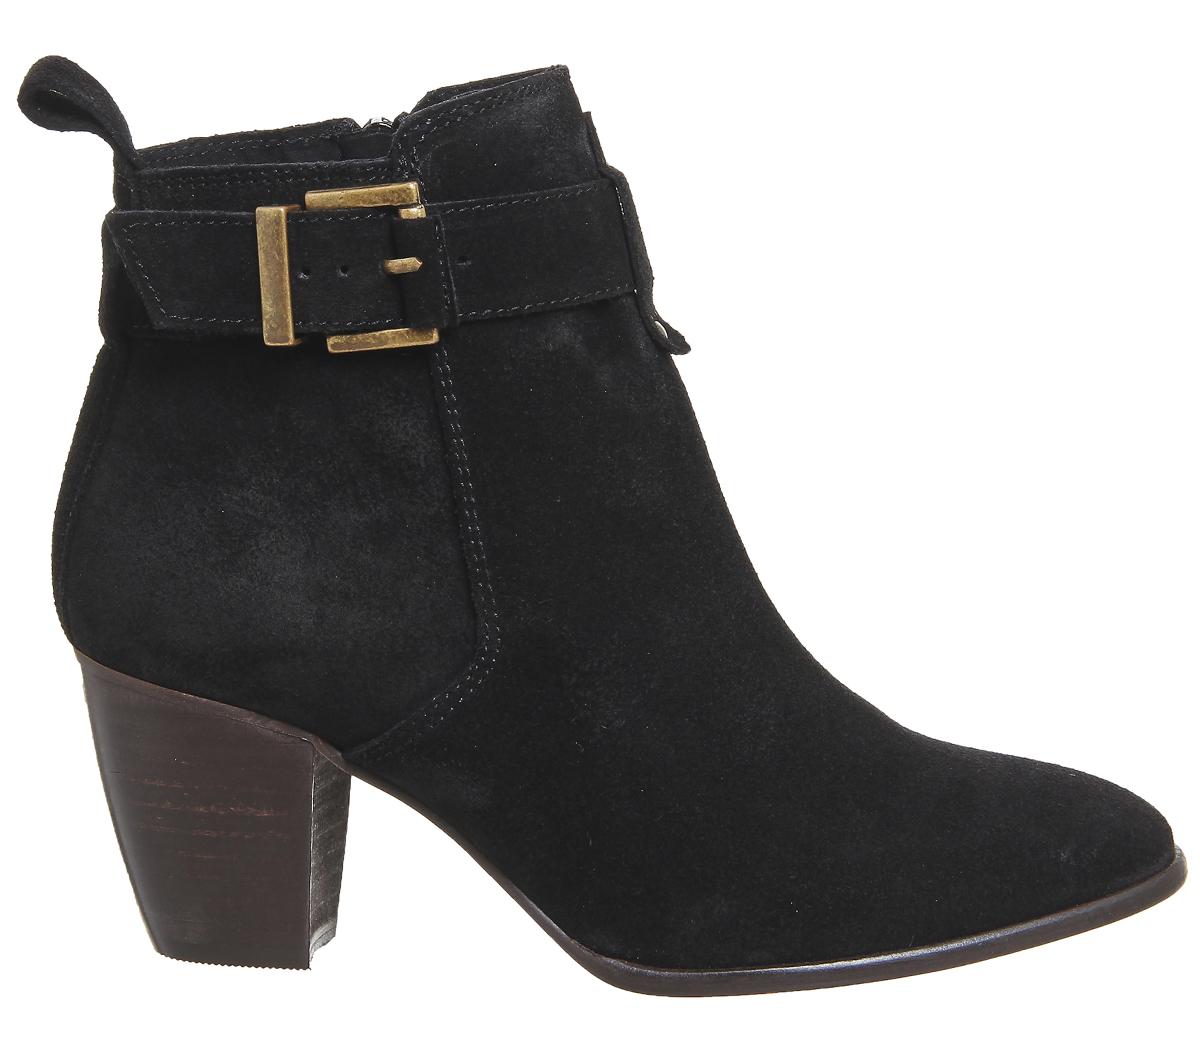 Damenschuhe Office Amelie Buckle Strap Western Stiefel Stiefel Western BLACK SUEDE Stiefel b215a5